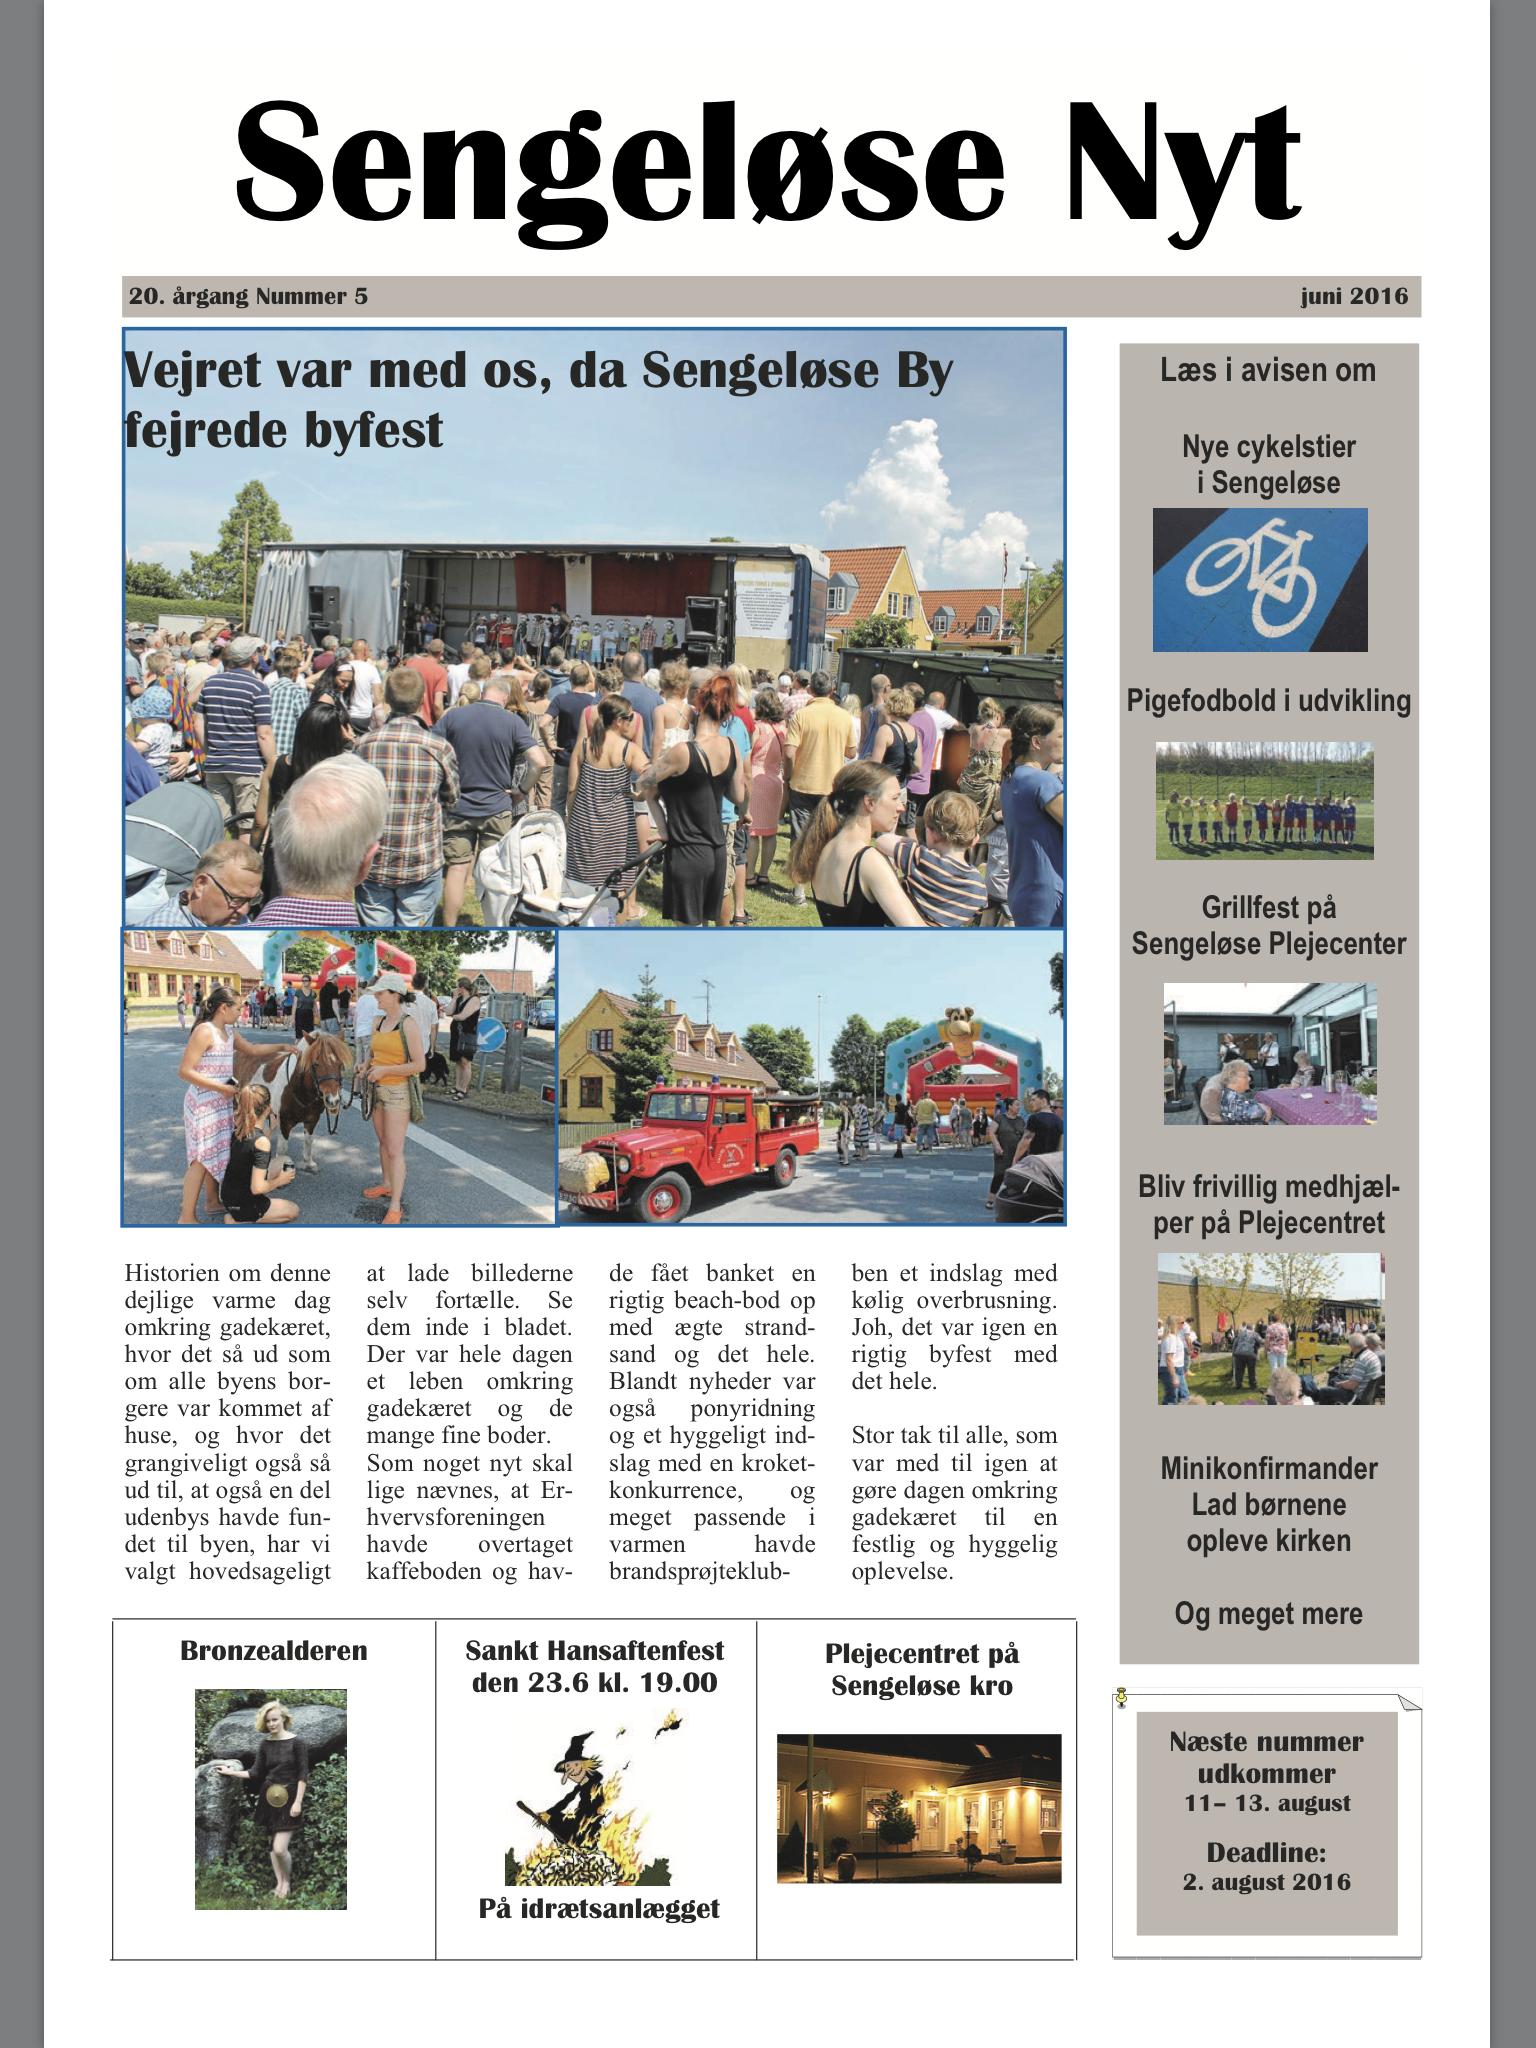 Sengeløse Nyt juni 2016